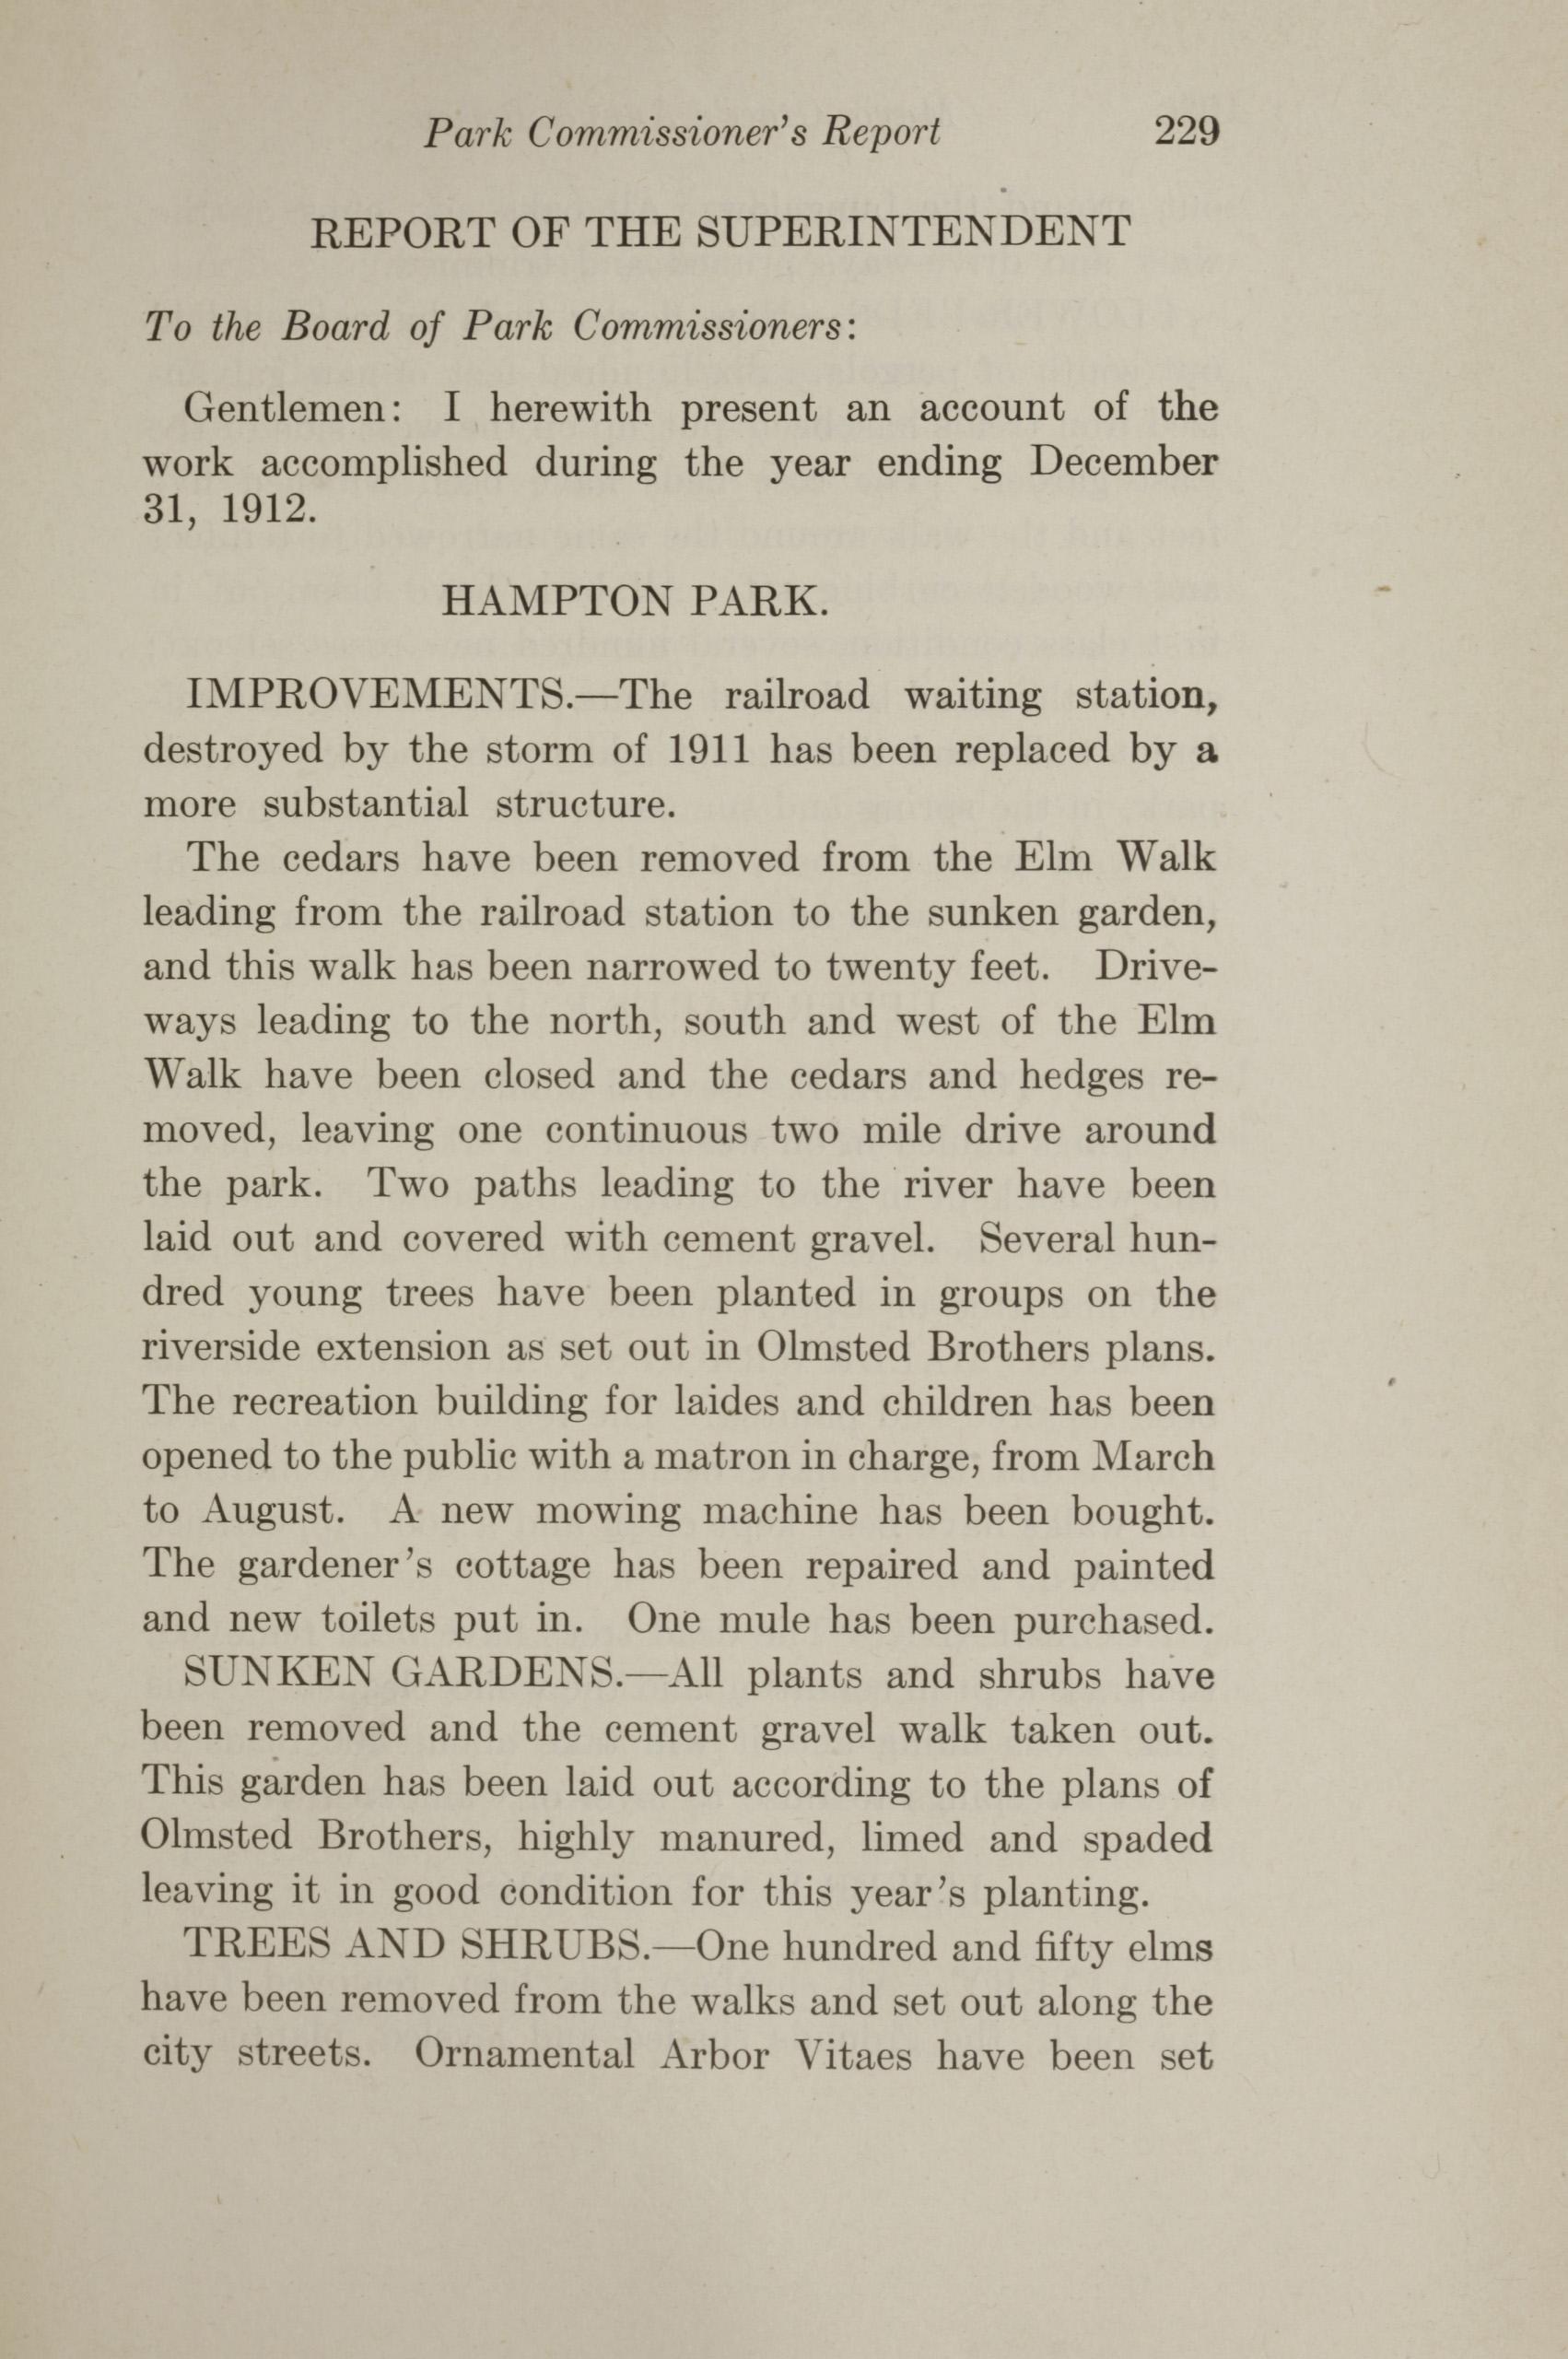 Charleston Yearbook, 1912, page 229